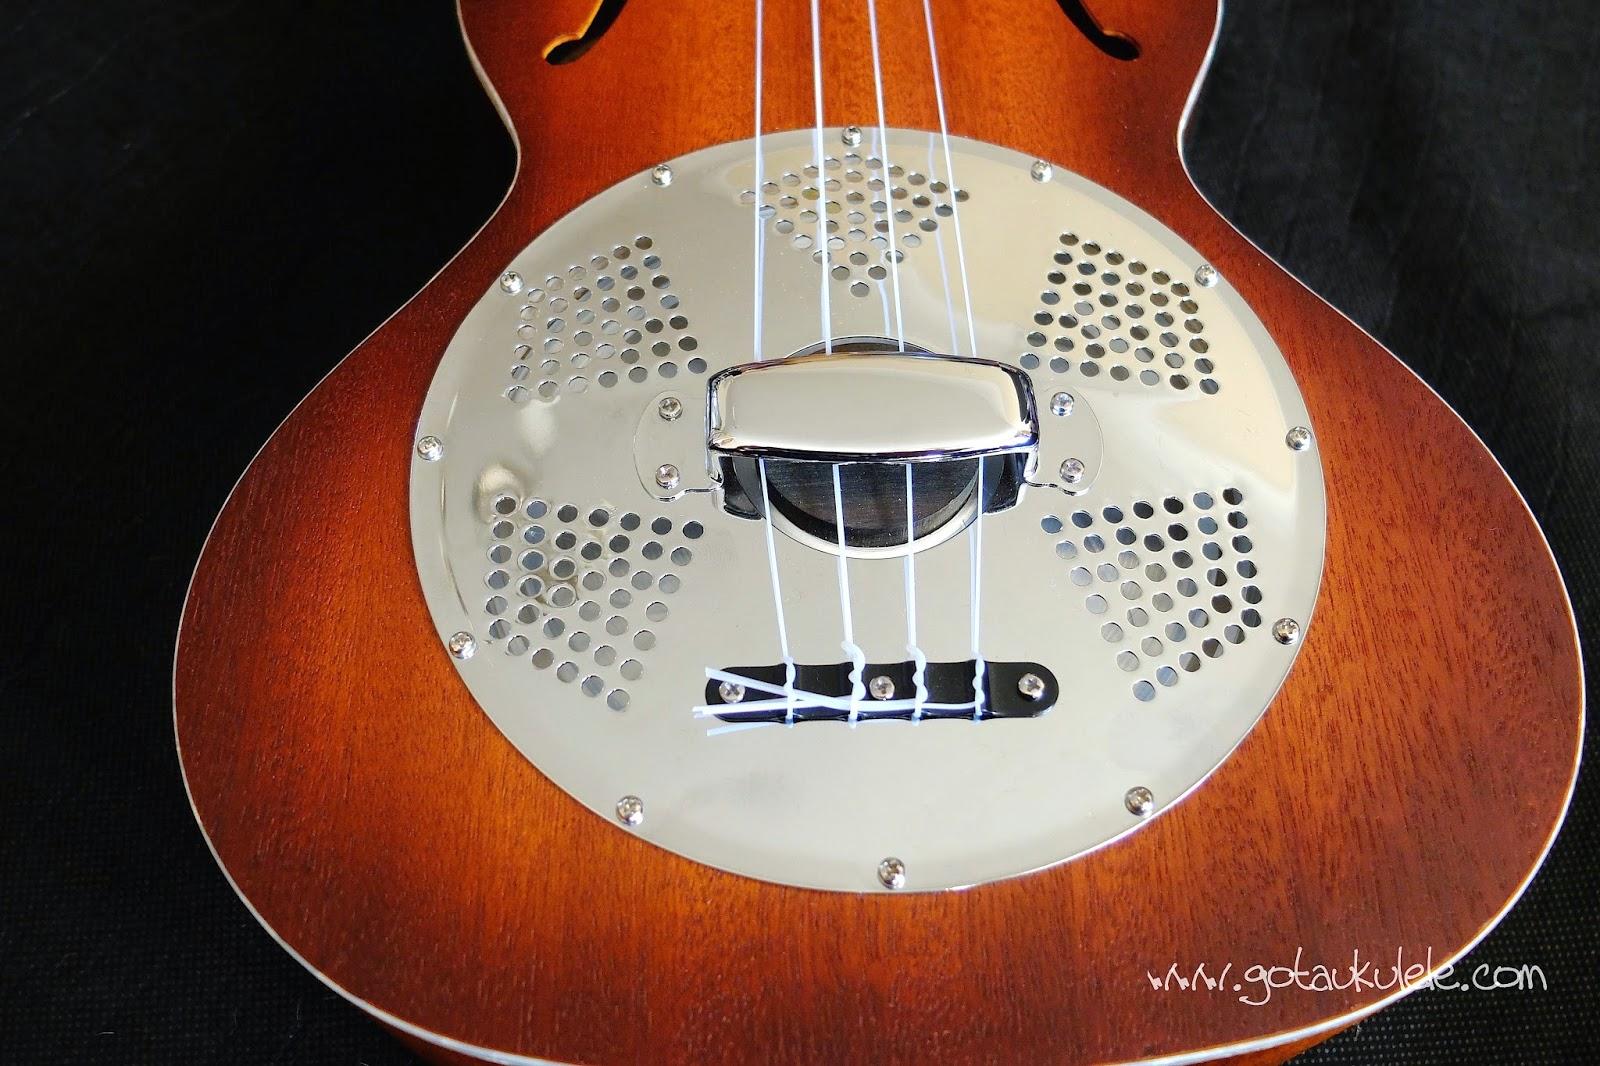 Kala KA-RES- CHR Tenor Resonator ukulele cone